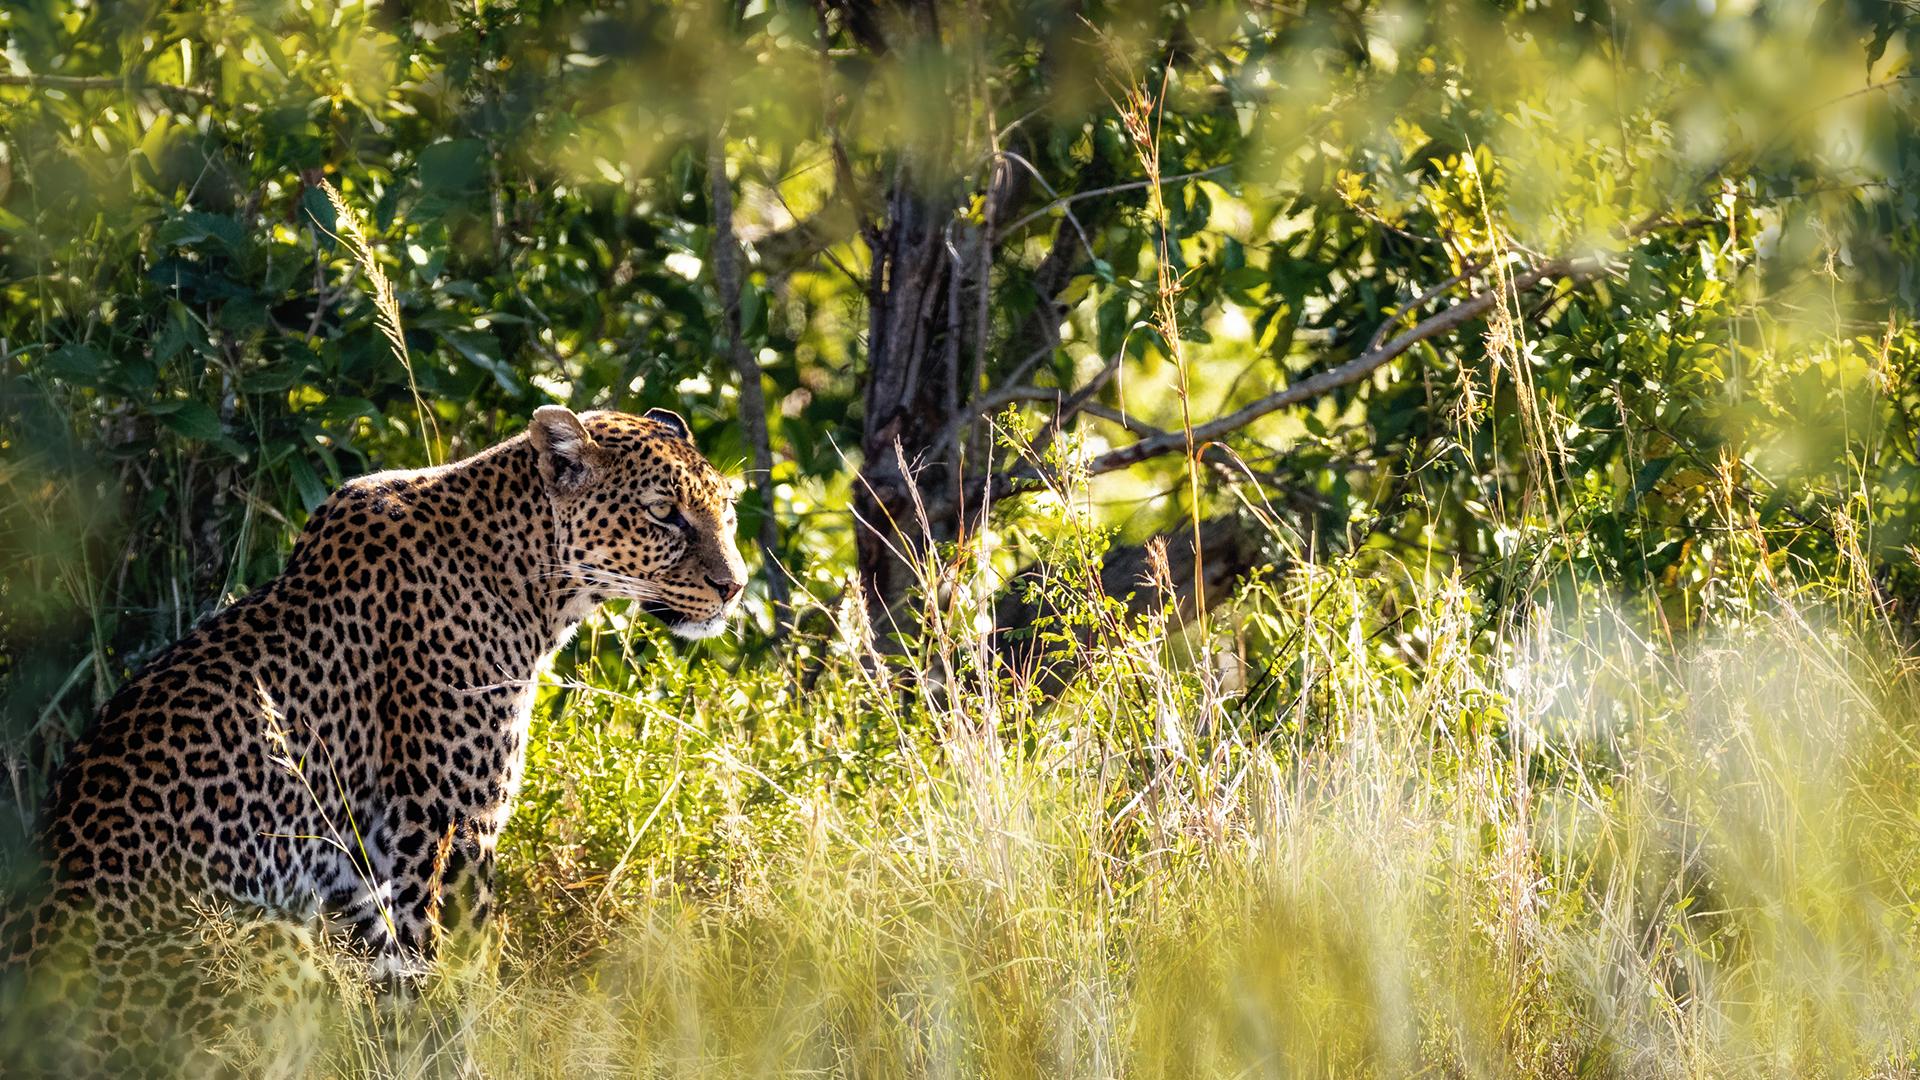 Leopard in Wild of Kenya Africa.jpg